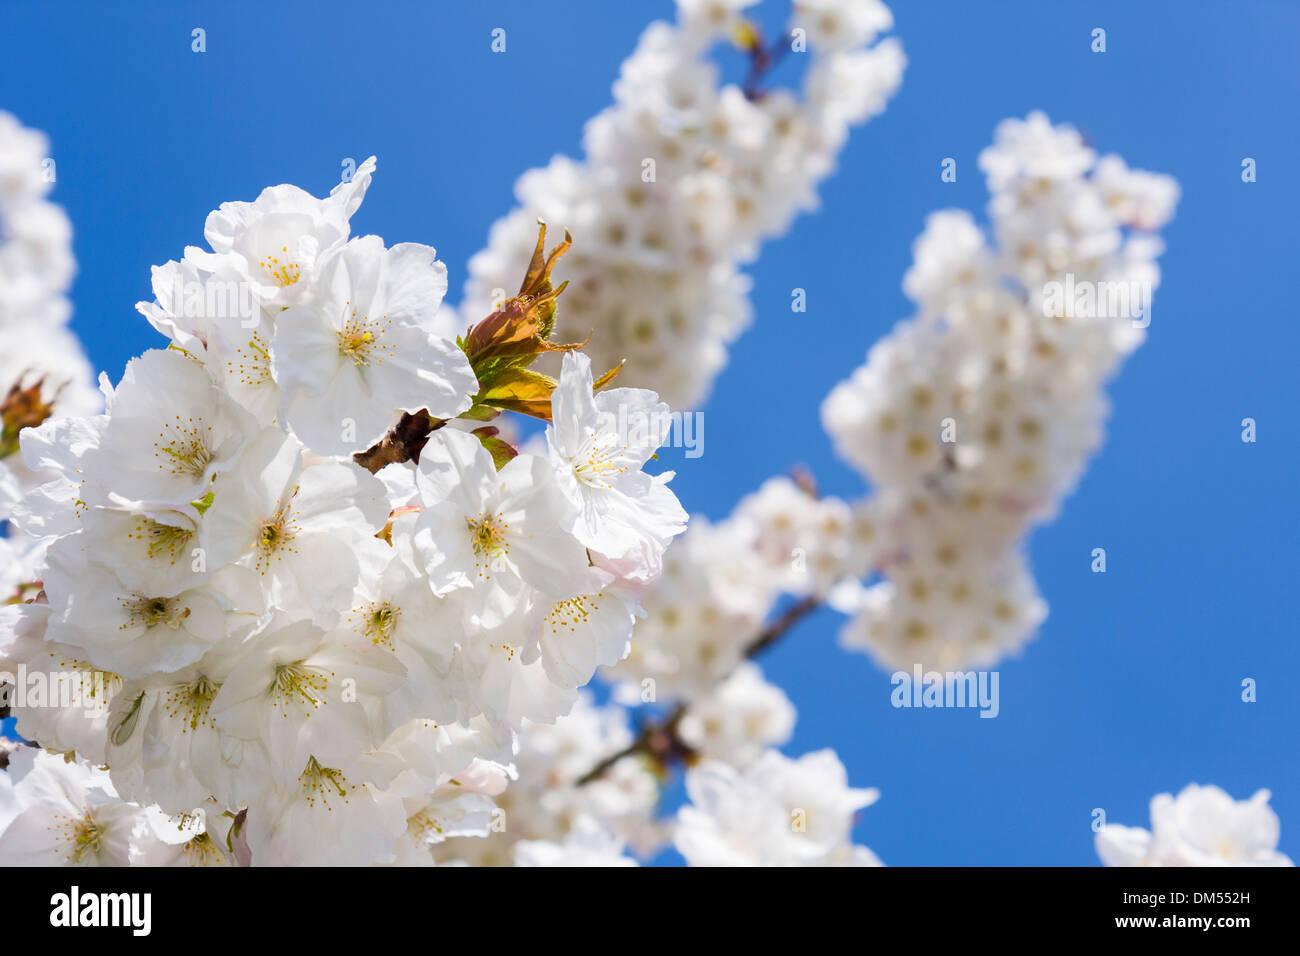 White cherry blossom Rosaceae Prunus, 'Shirotae', set against a deep blue spring sky. - Stock Image